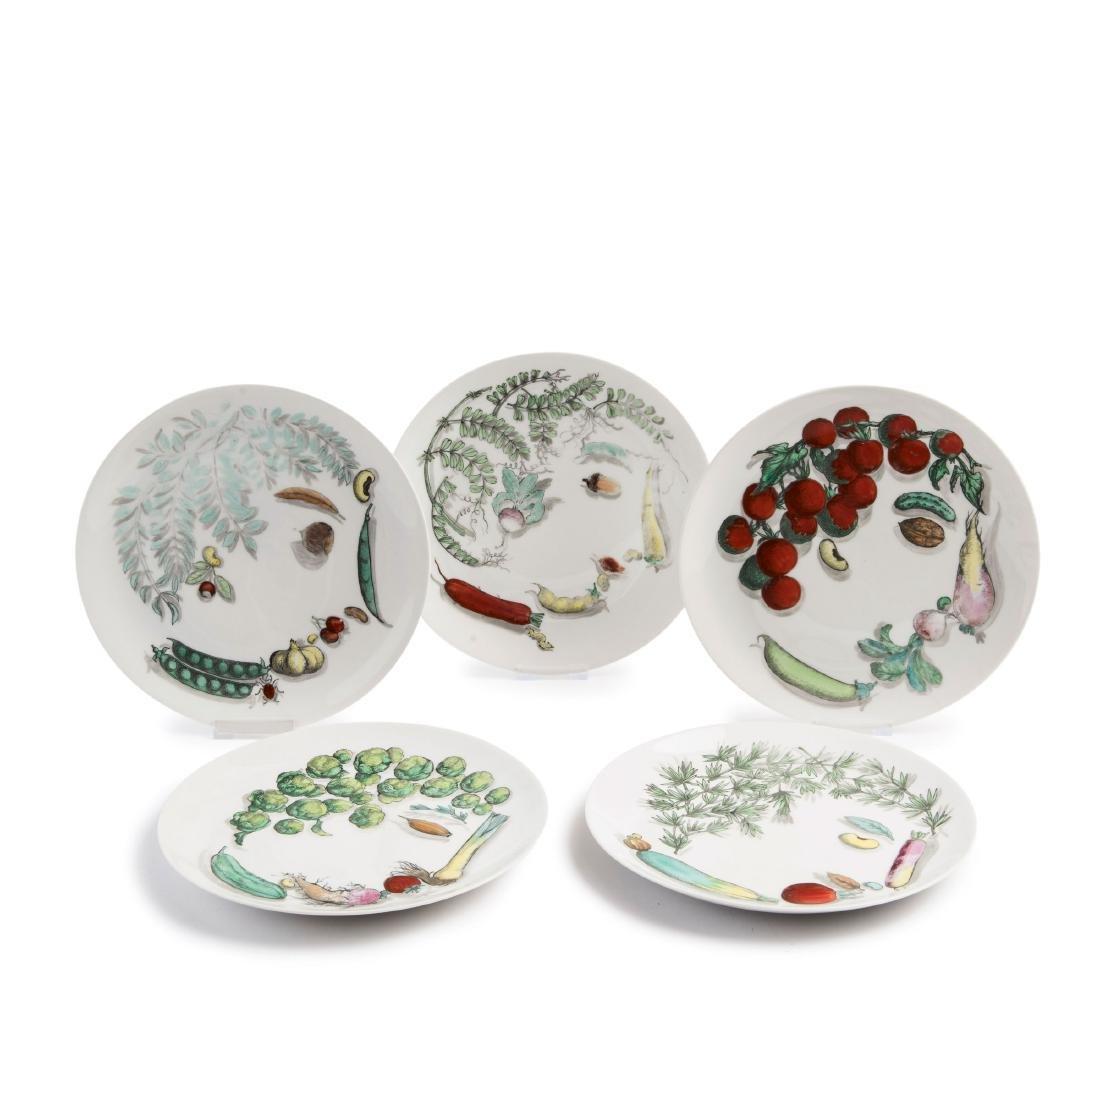 Five 'Vegetalia' plates, 1960s